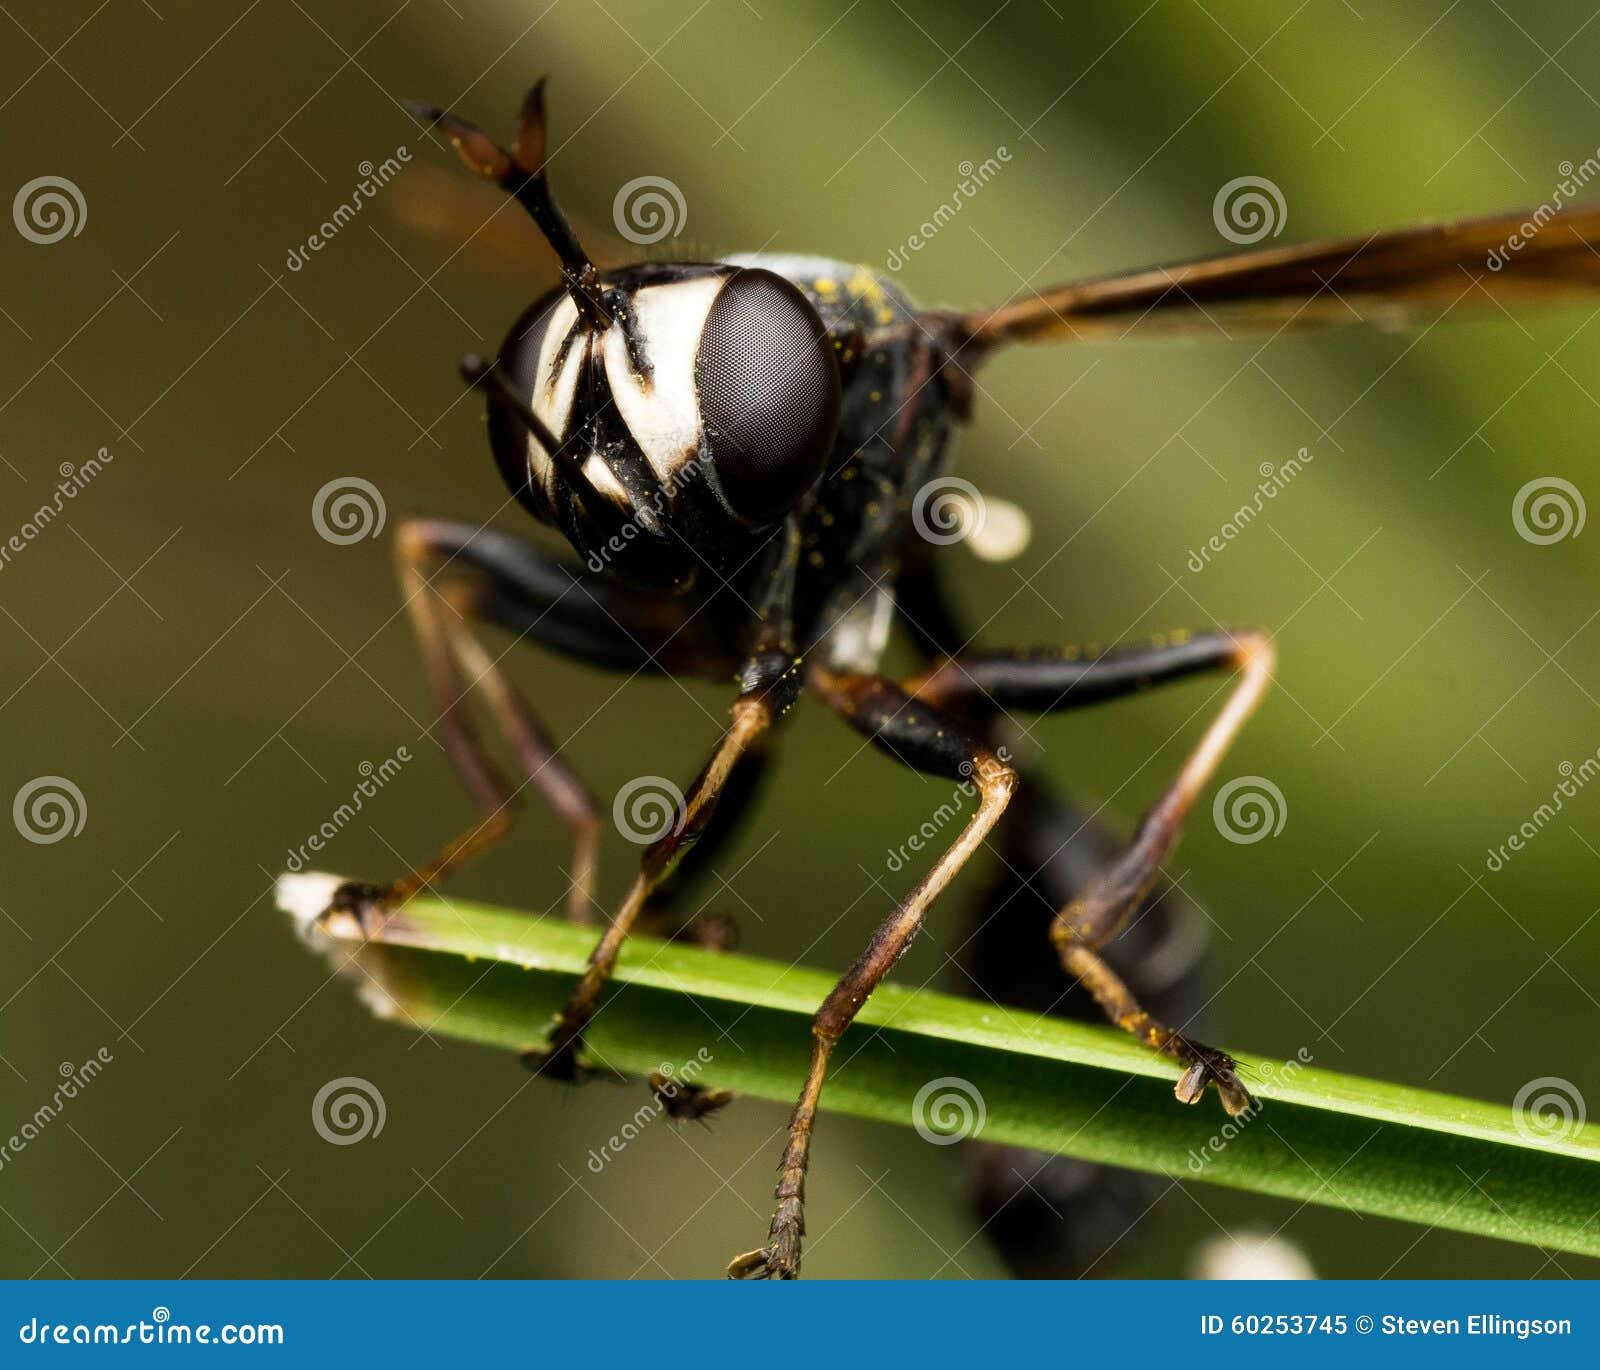 Schwarze Wespe Mit Defektem Flügel Auf Grünpflanze Stockbild Bild